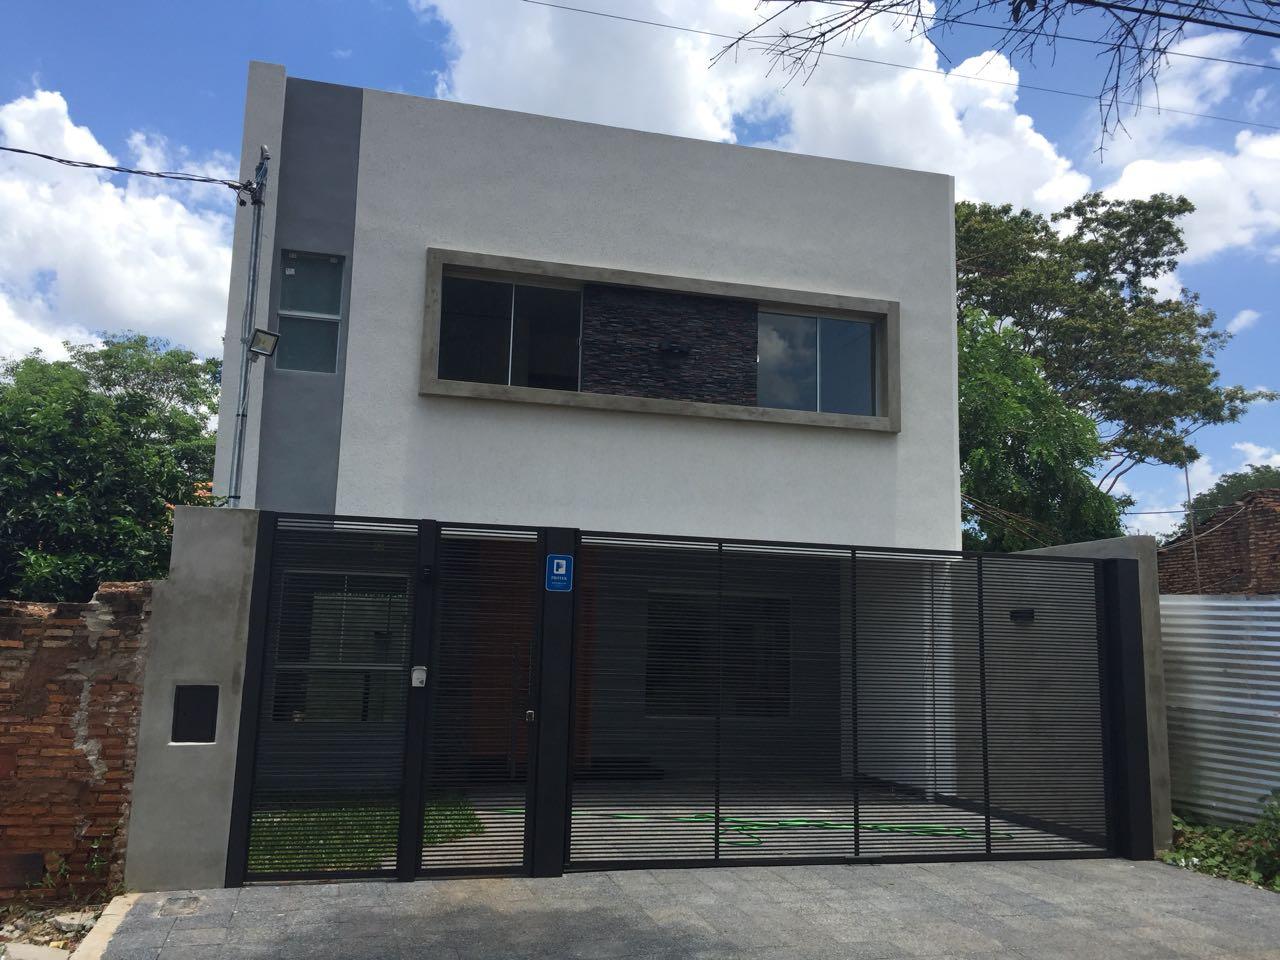 Se Vende Duplex Minimalista A Estrenar Zona Mariano Roque Alonso